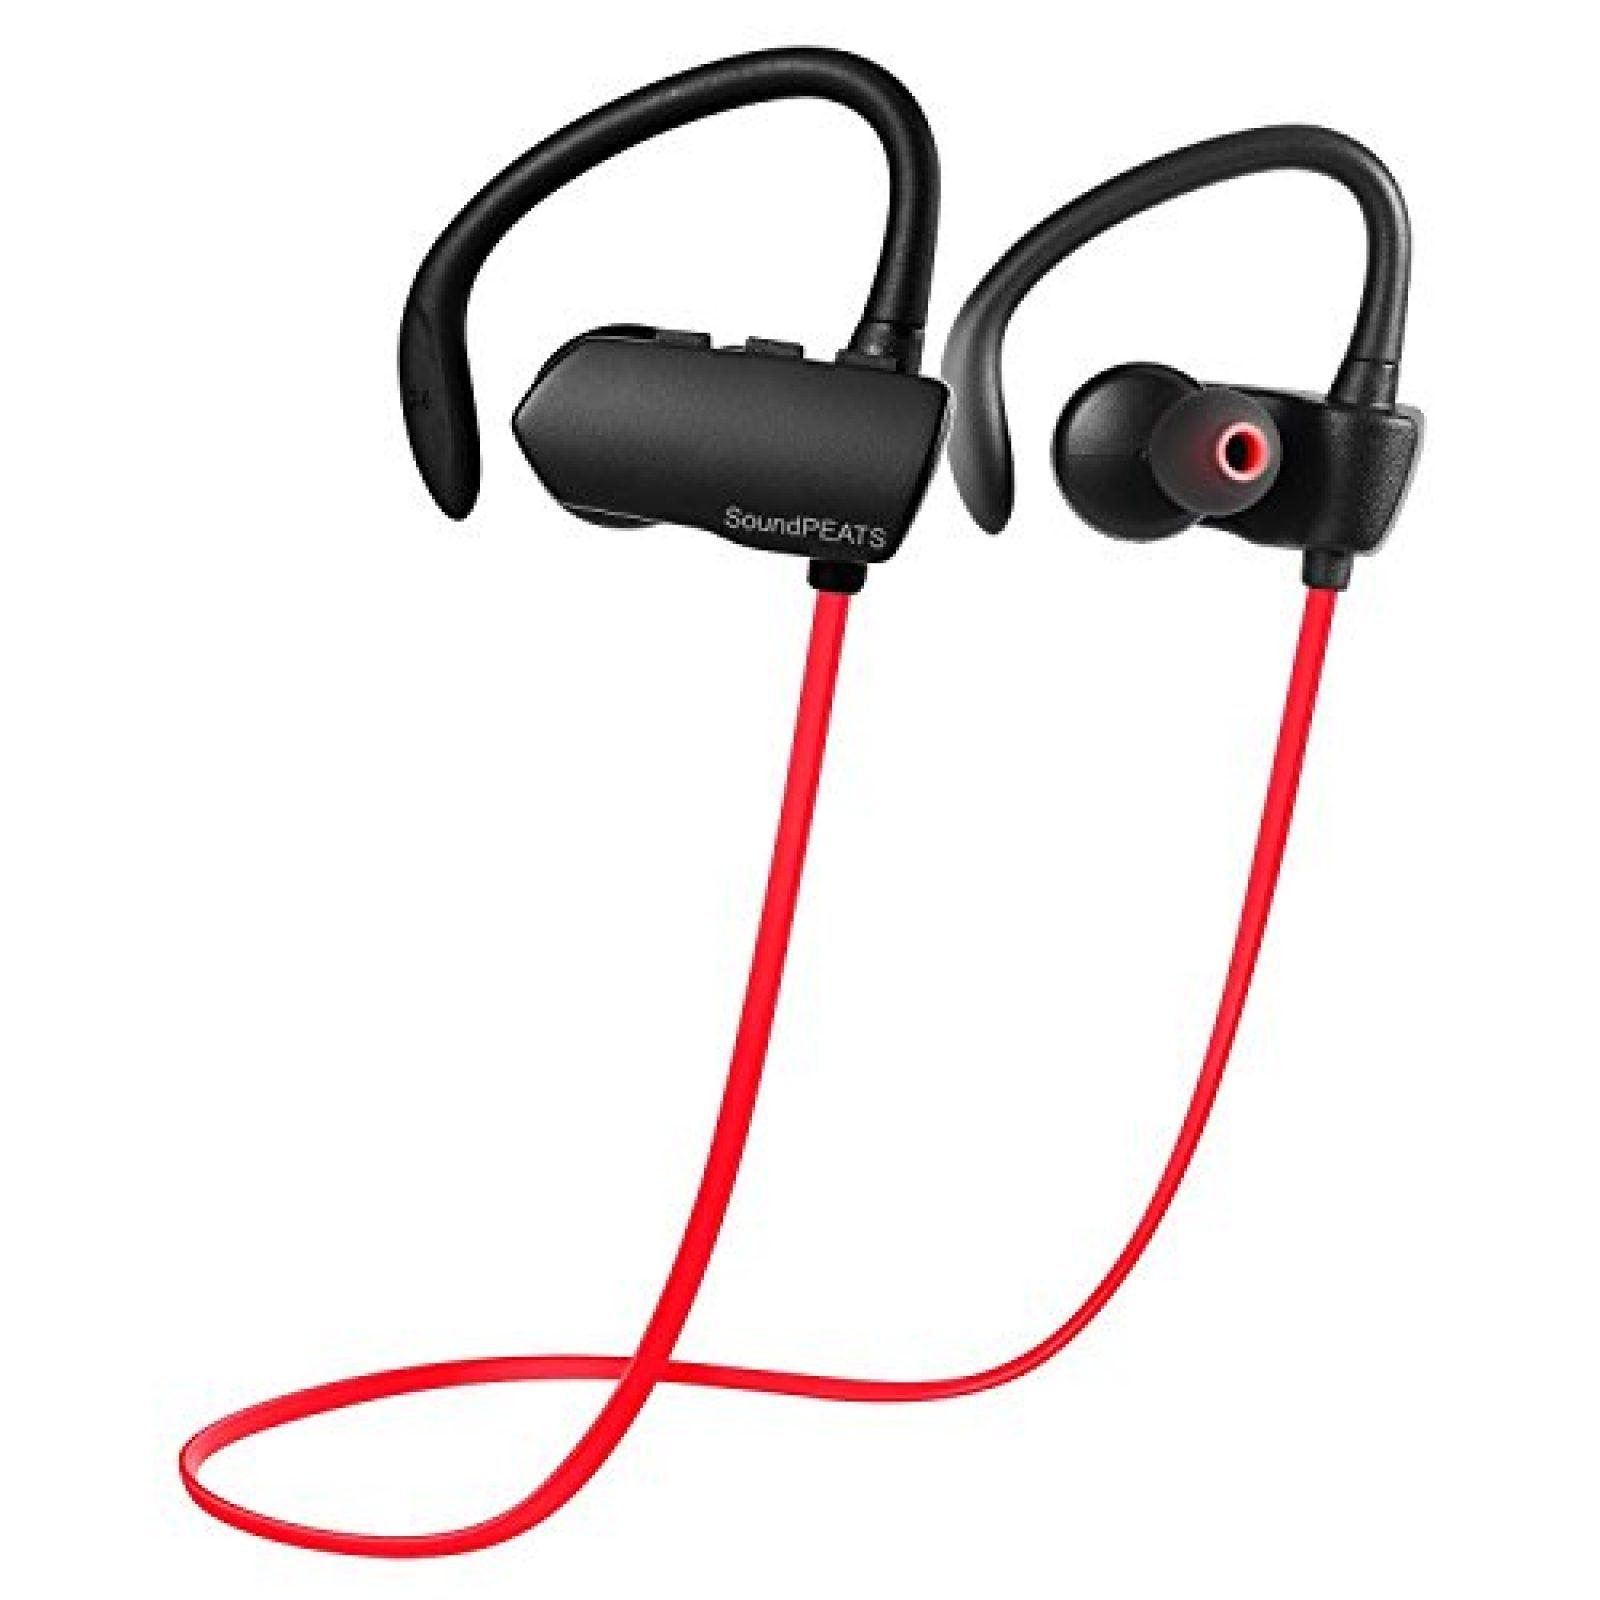 SoundPEATSQ9A Bluetooth Wireless Earphones Headphones